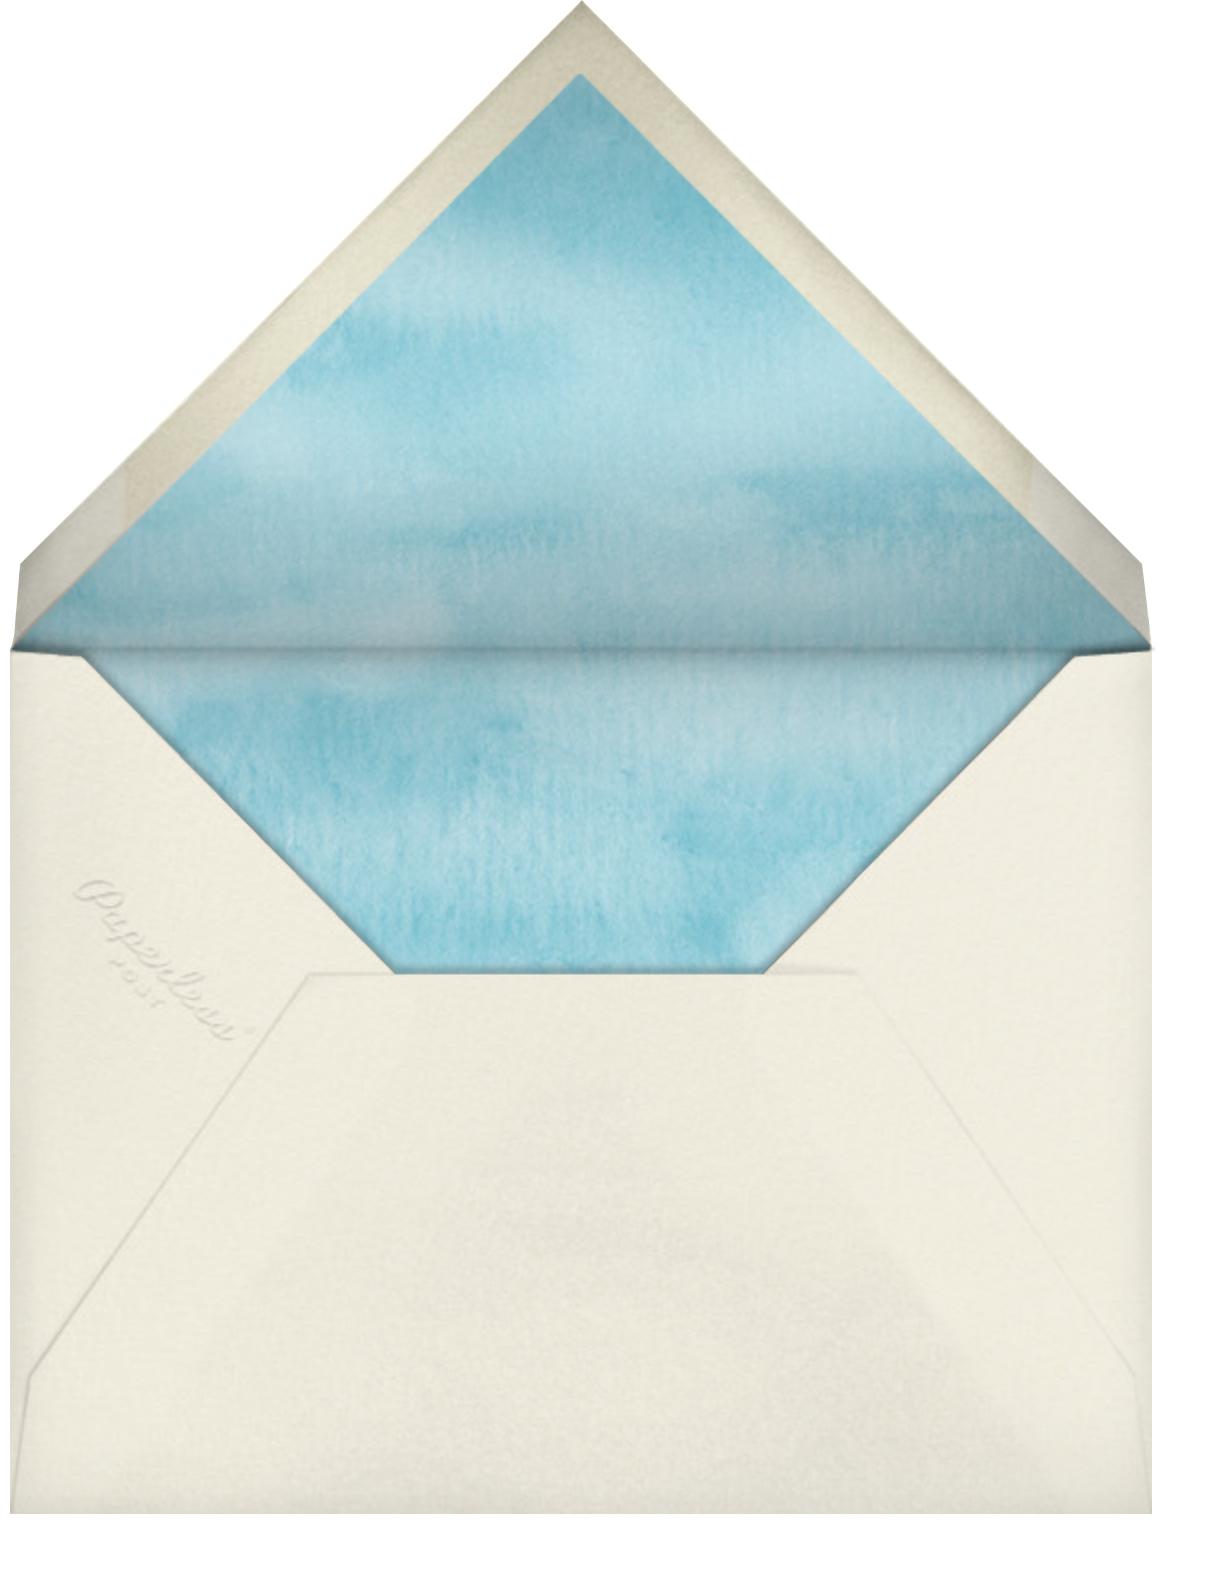 Dreidels and Gelt - Felix Doolittle - Hanukkah - envelope back